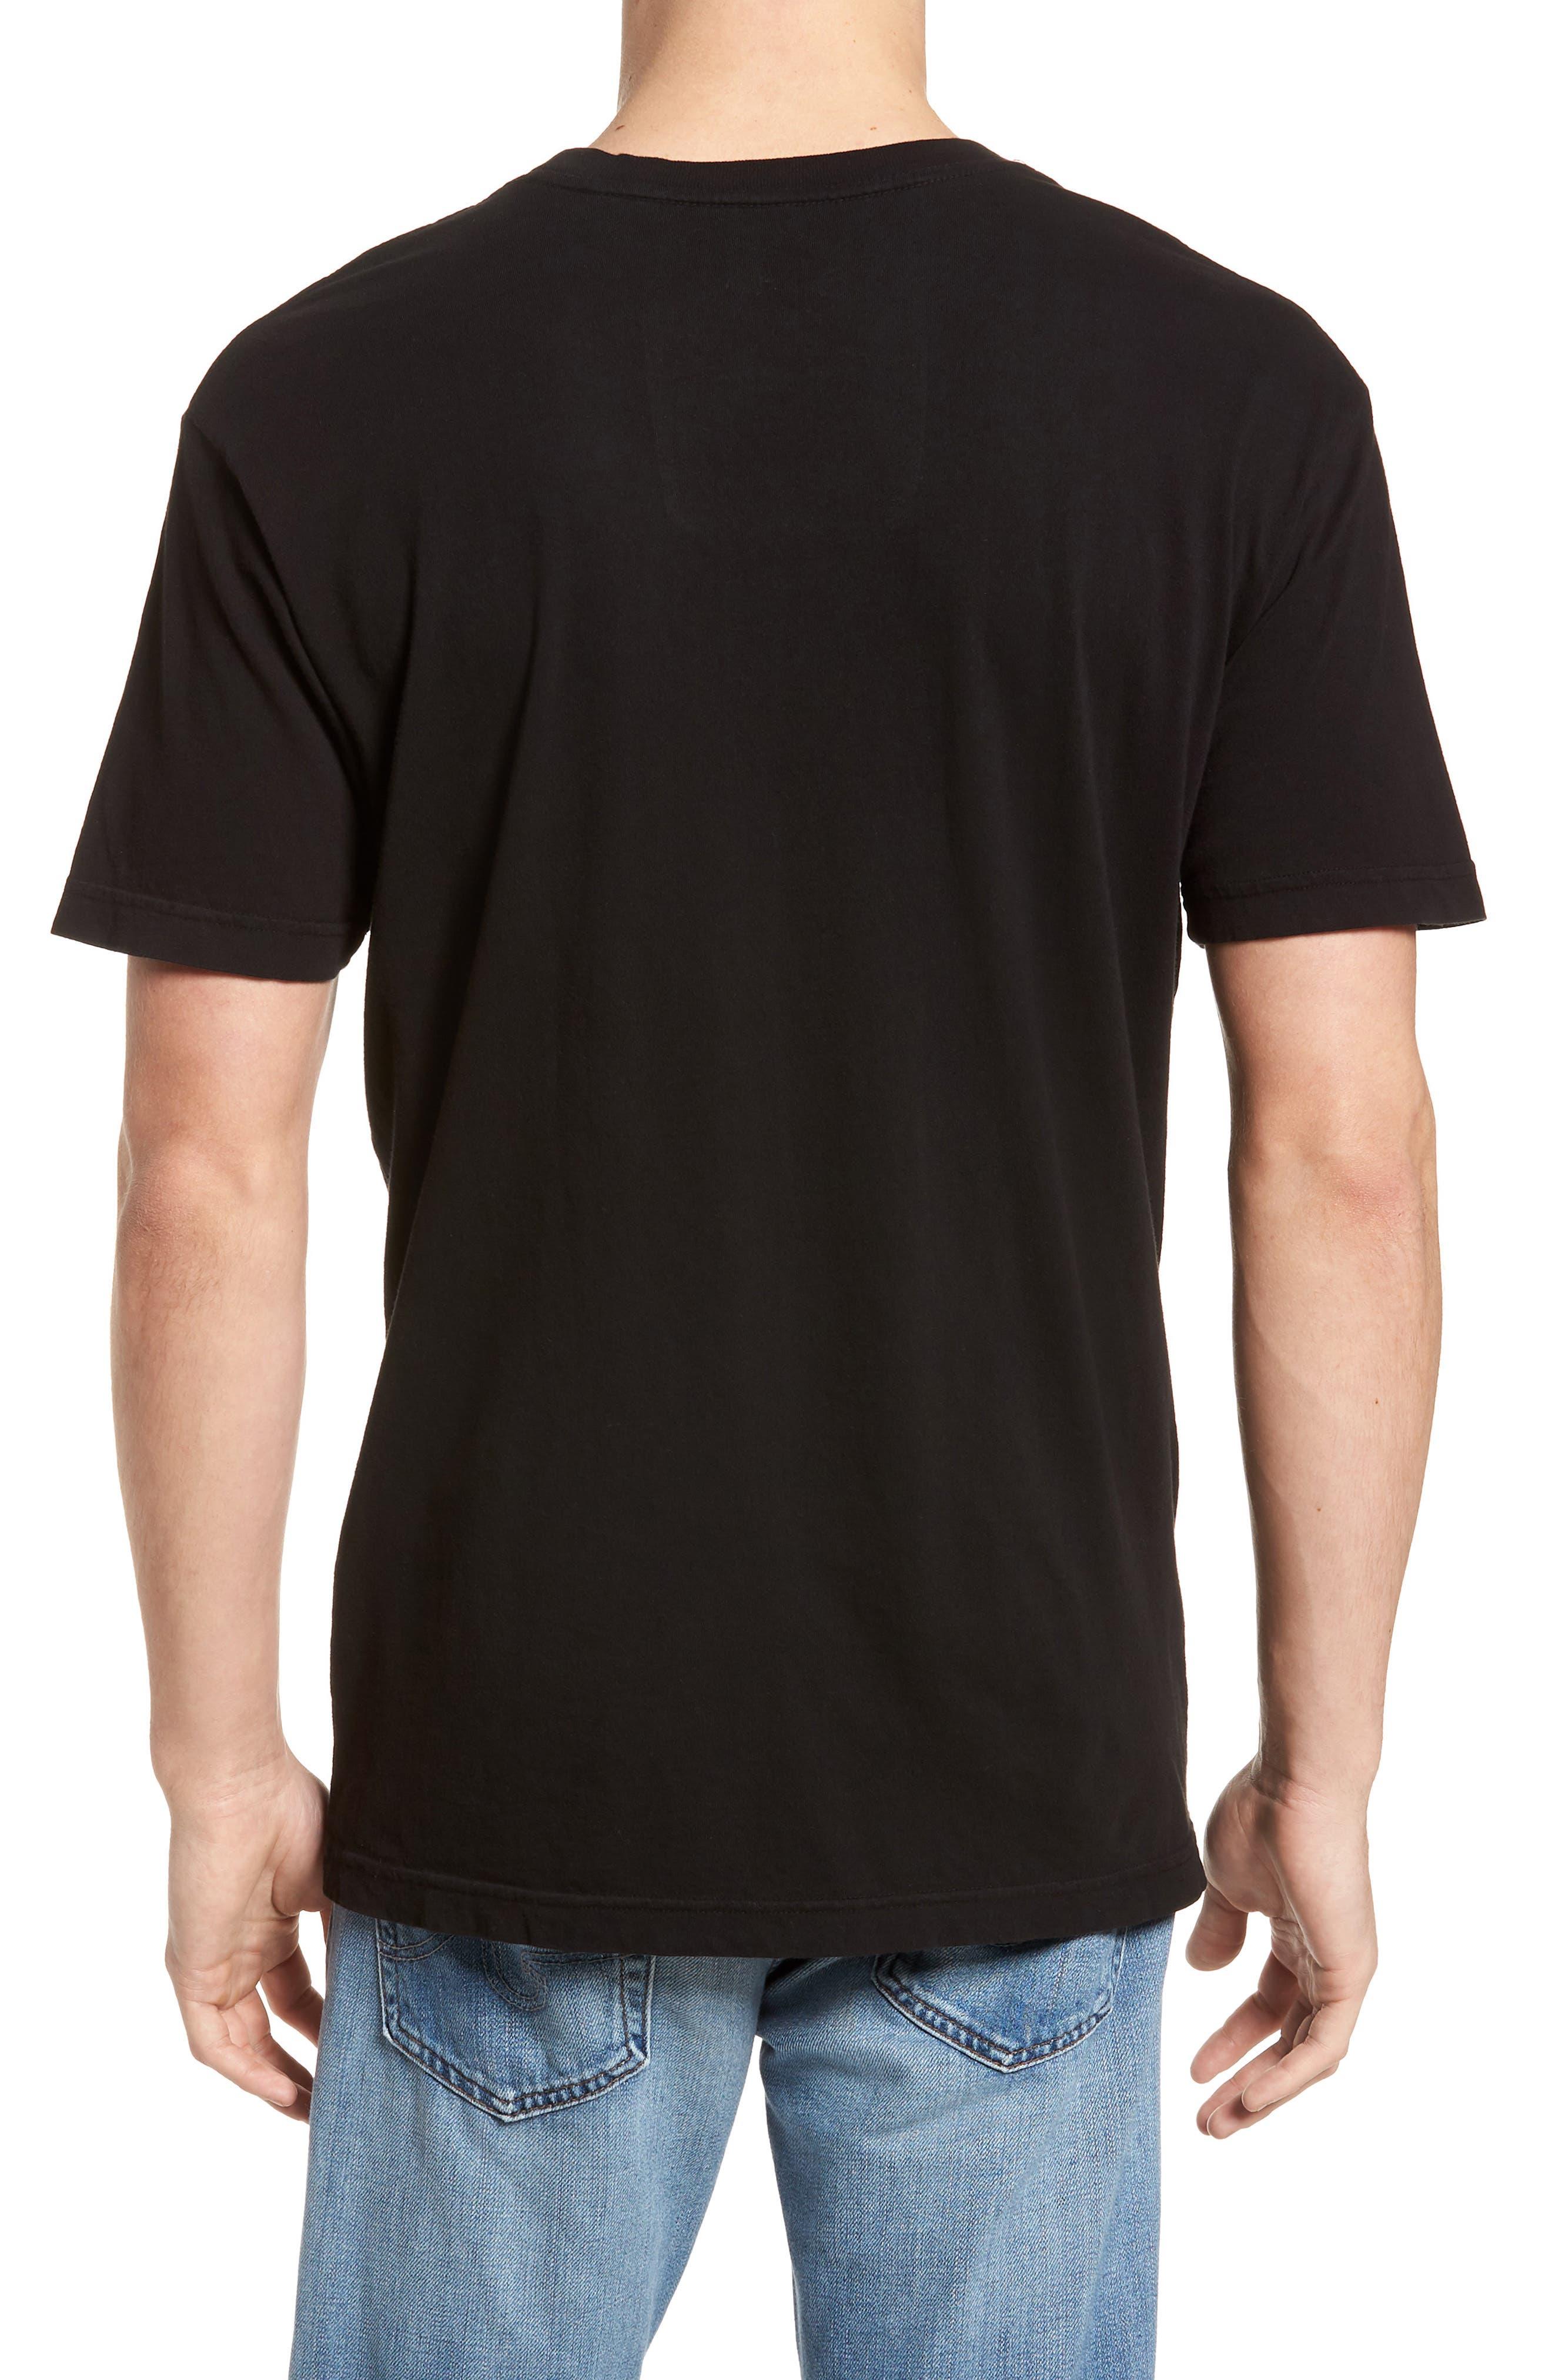 Patriot Graphic T-Shirt,                             Alternate thumbnail 2, color,                             001